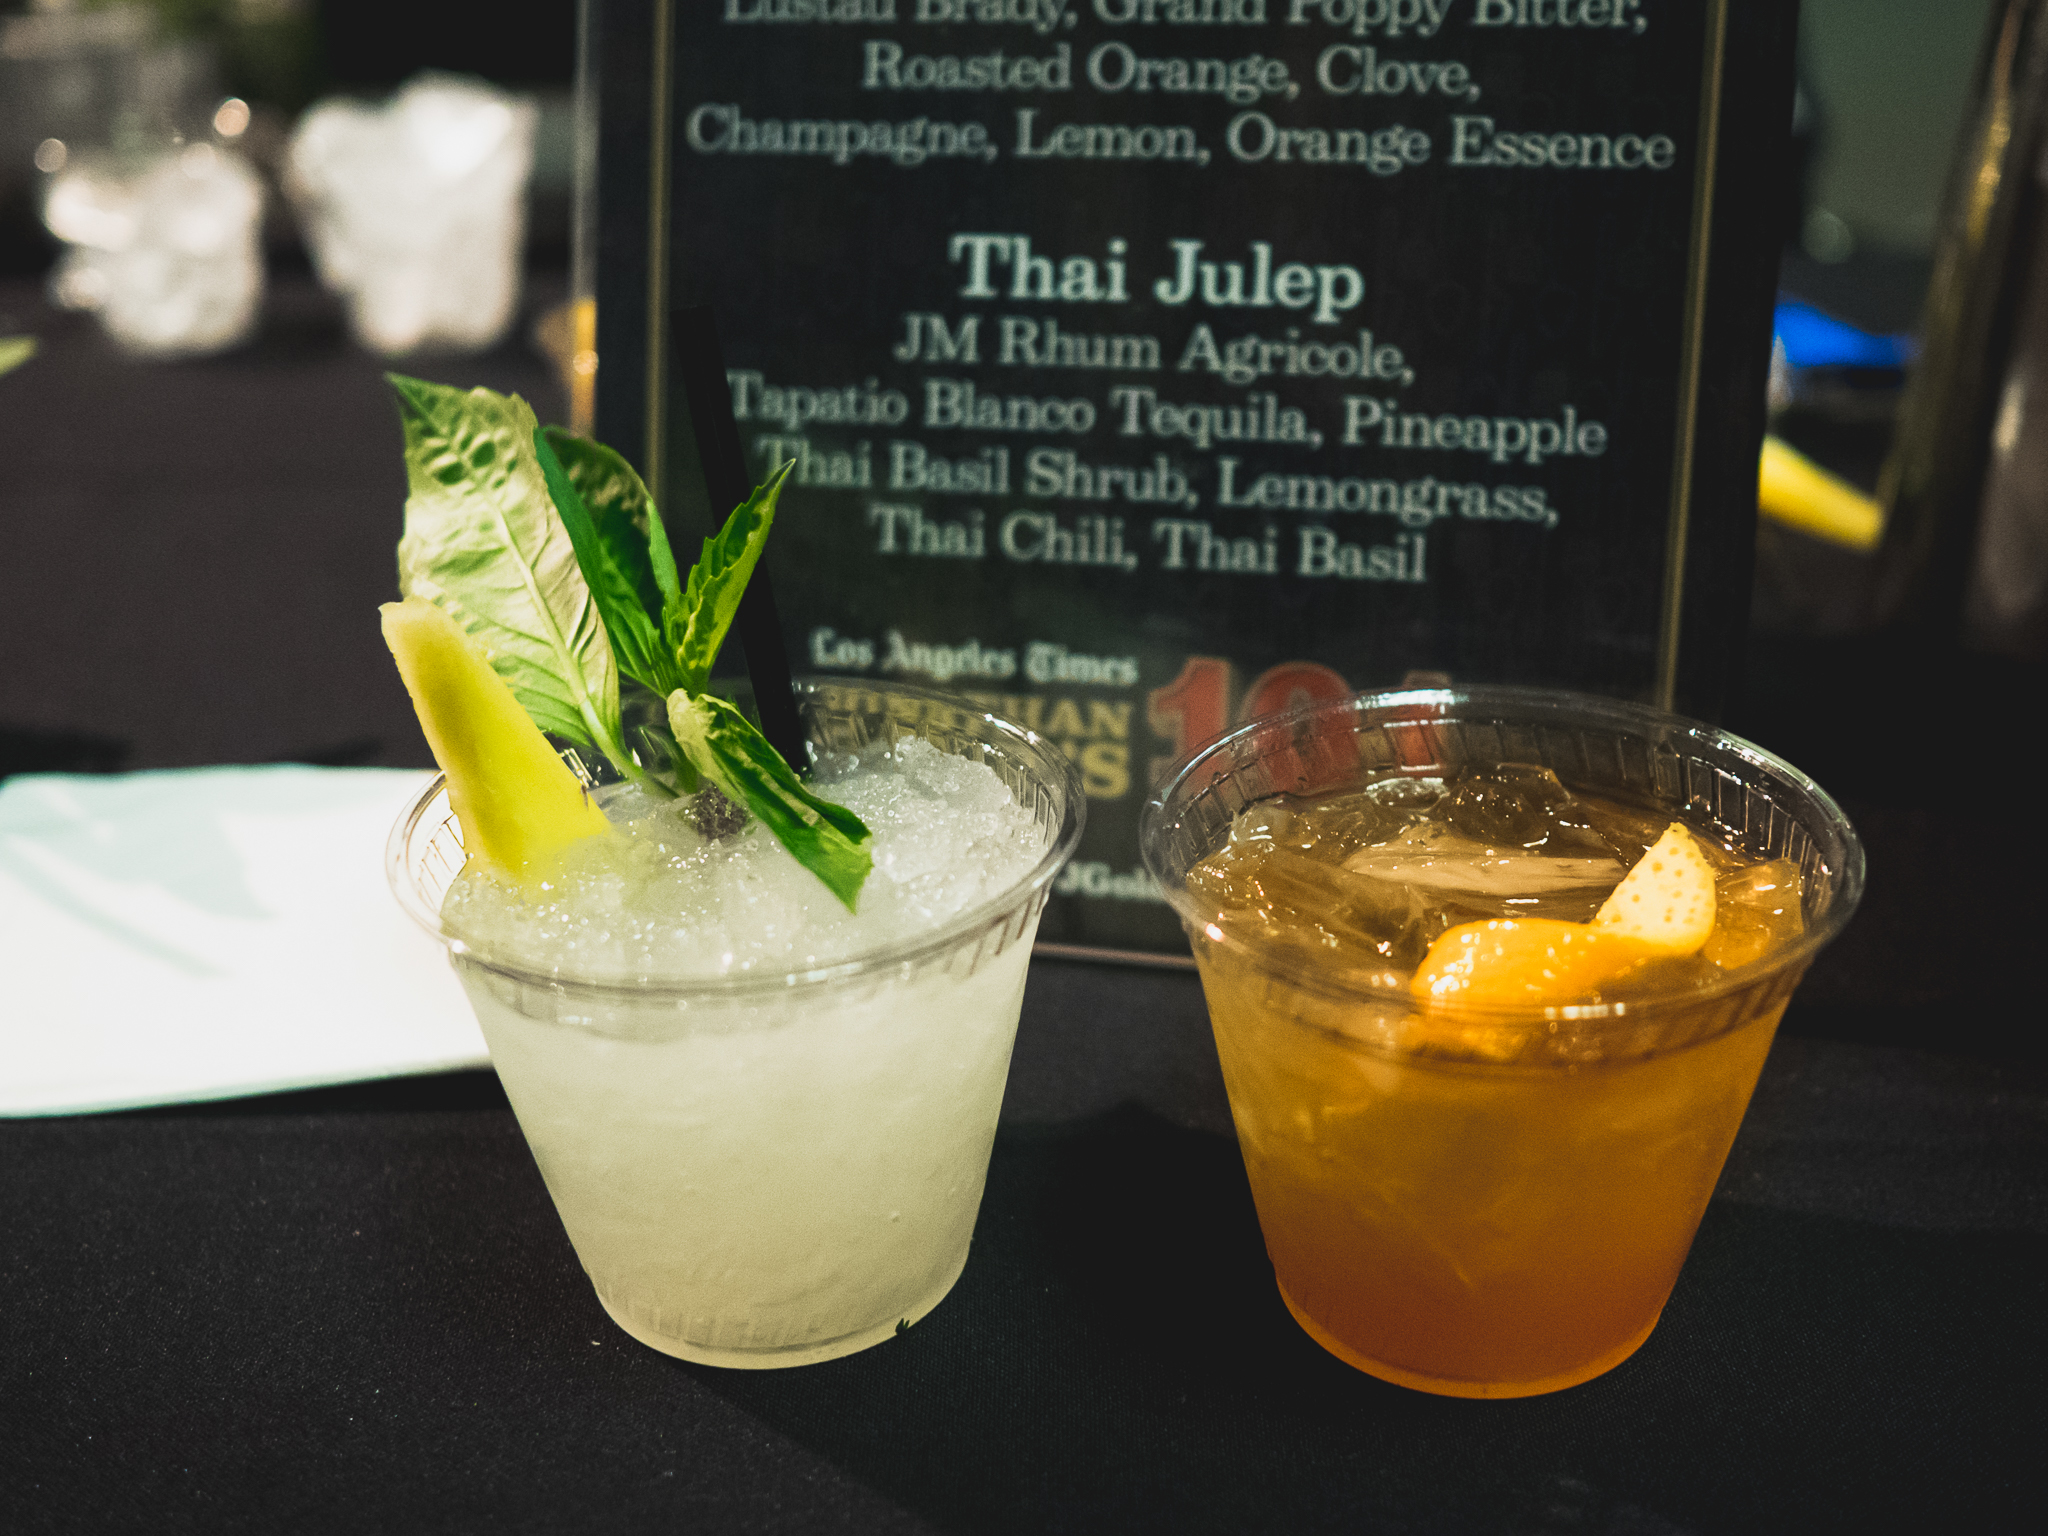 redbird's  thai julep  (jm rhum agricole, arette blanco tequila, pineapple thai basil shrub, lemongrass, thai chili, thai basil) and cardinal punch.